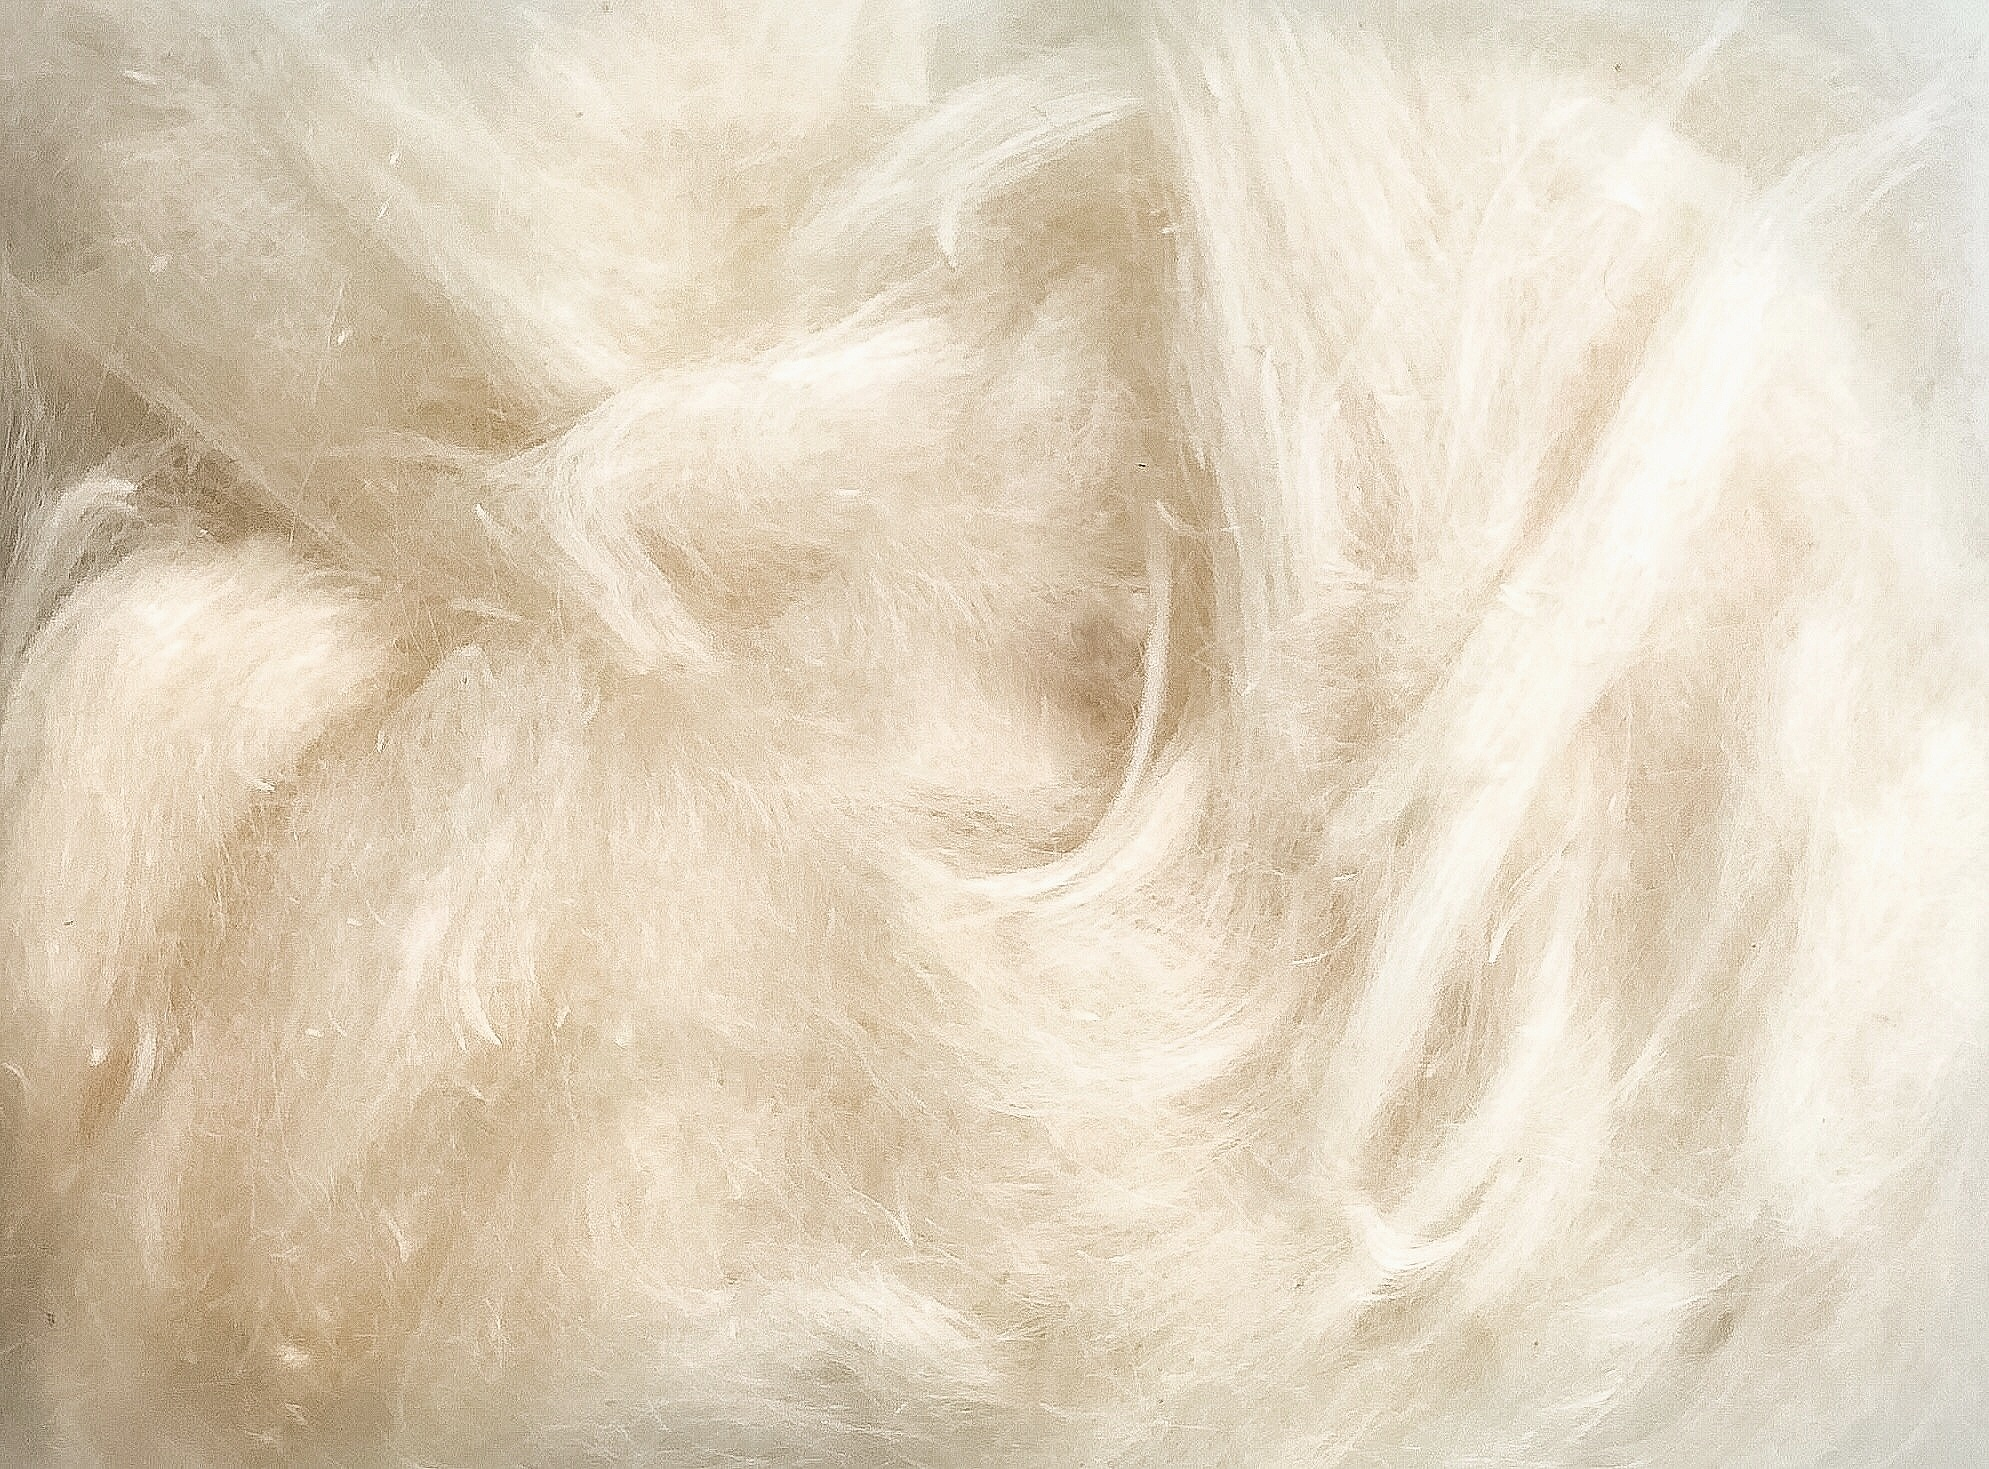 raw milkweed fibers